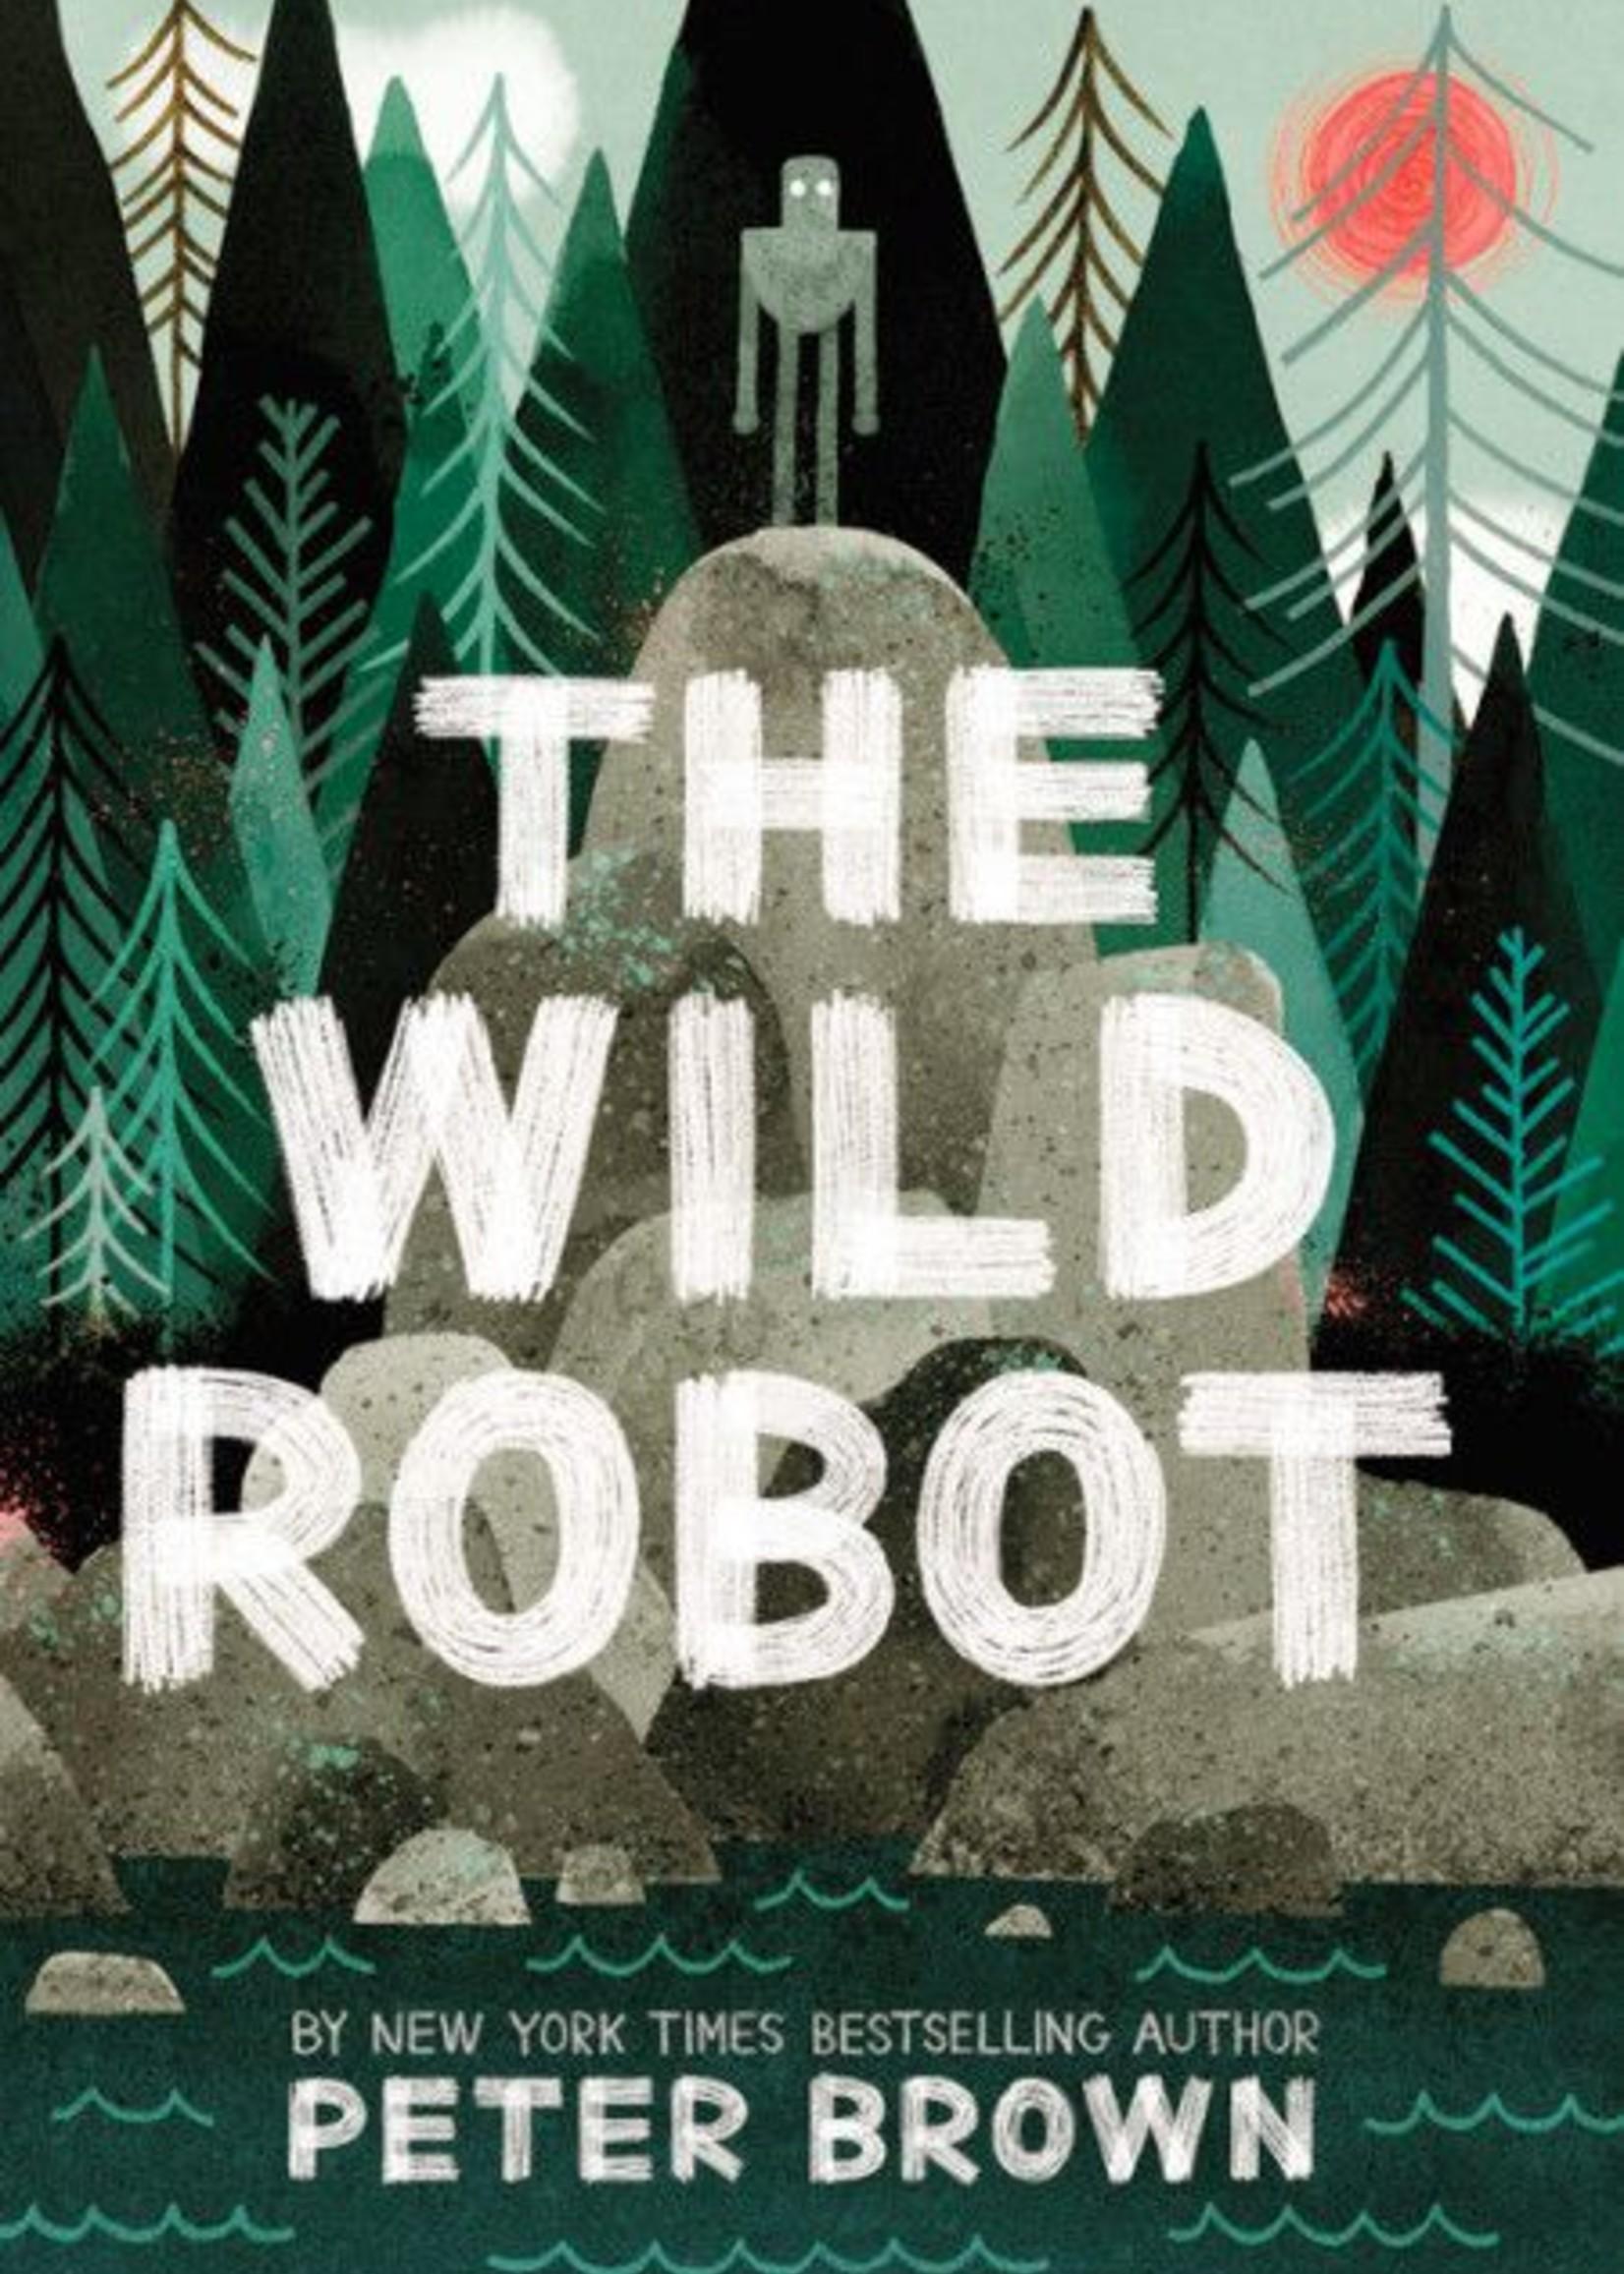 The Wild Robot #01 - Hardcover